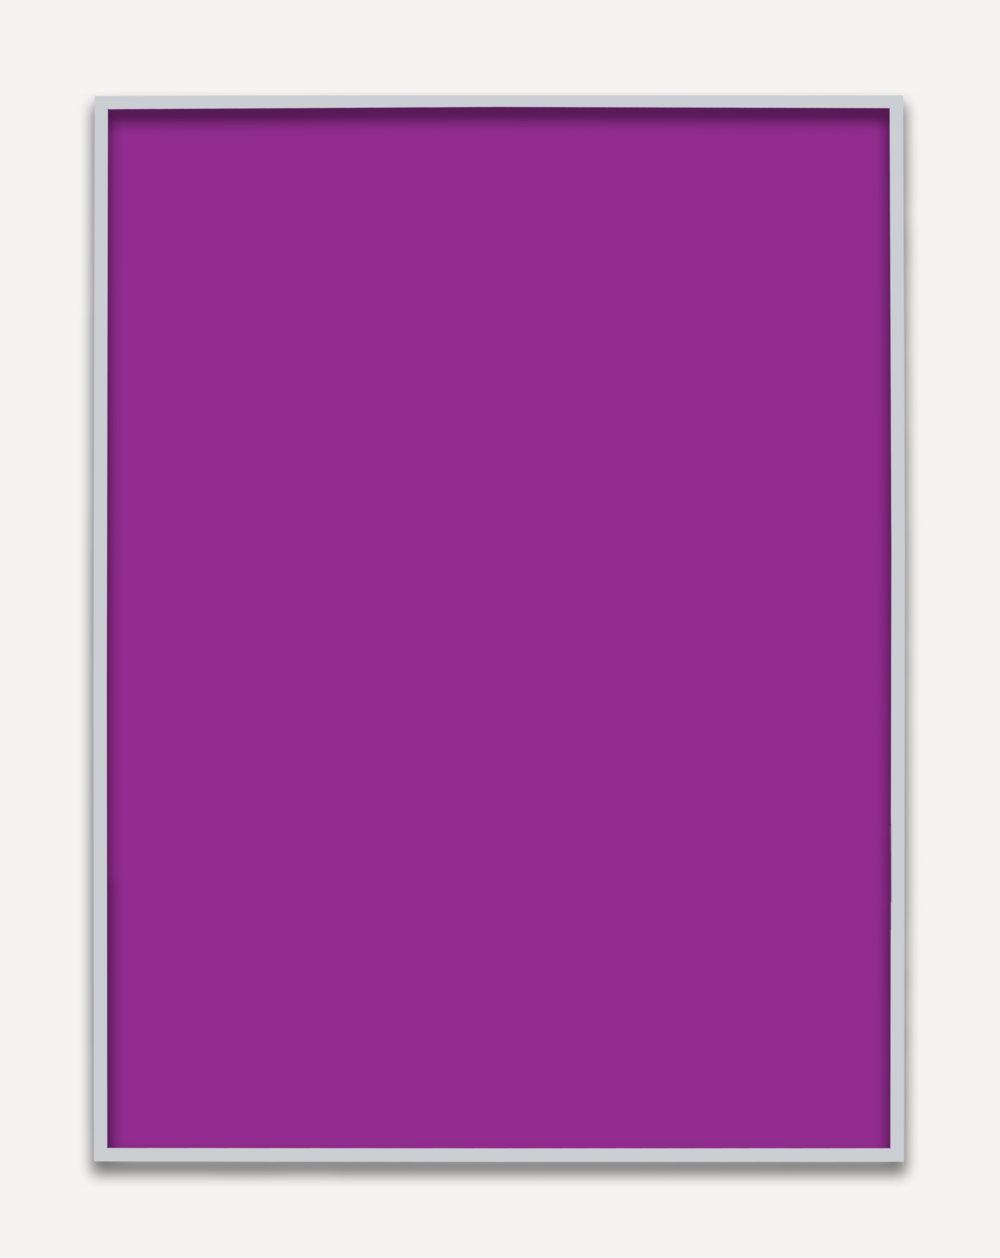 Untitled (Purple Monochrome), 2015 unique chromogenic prints 153,5 x 123,5 cm - 60 3/8 x 48 5/8 inches (framed)